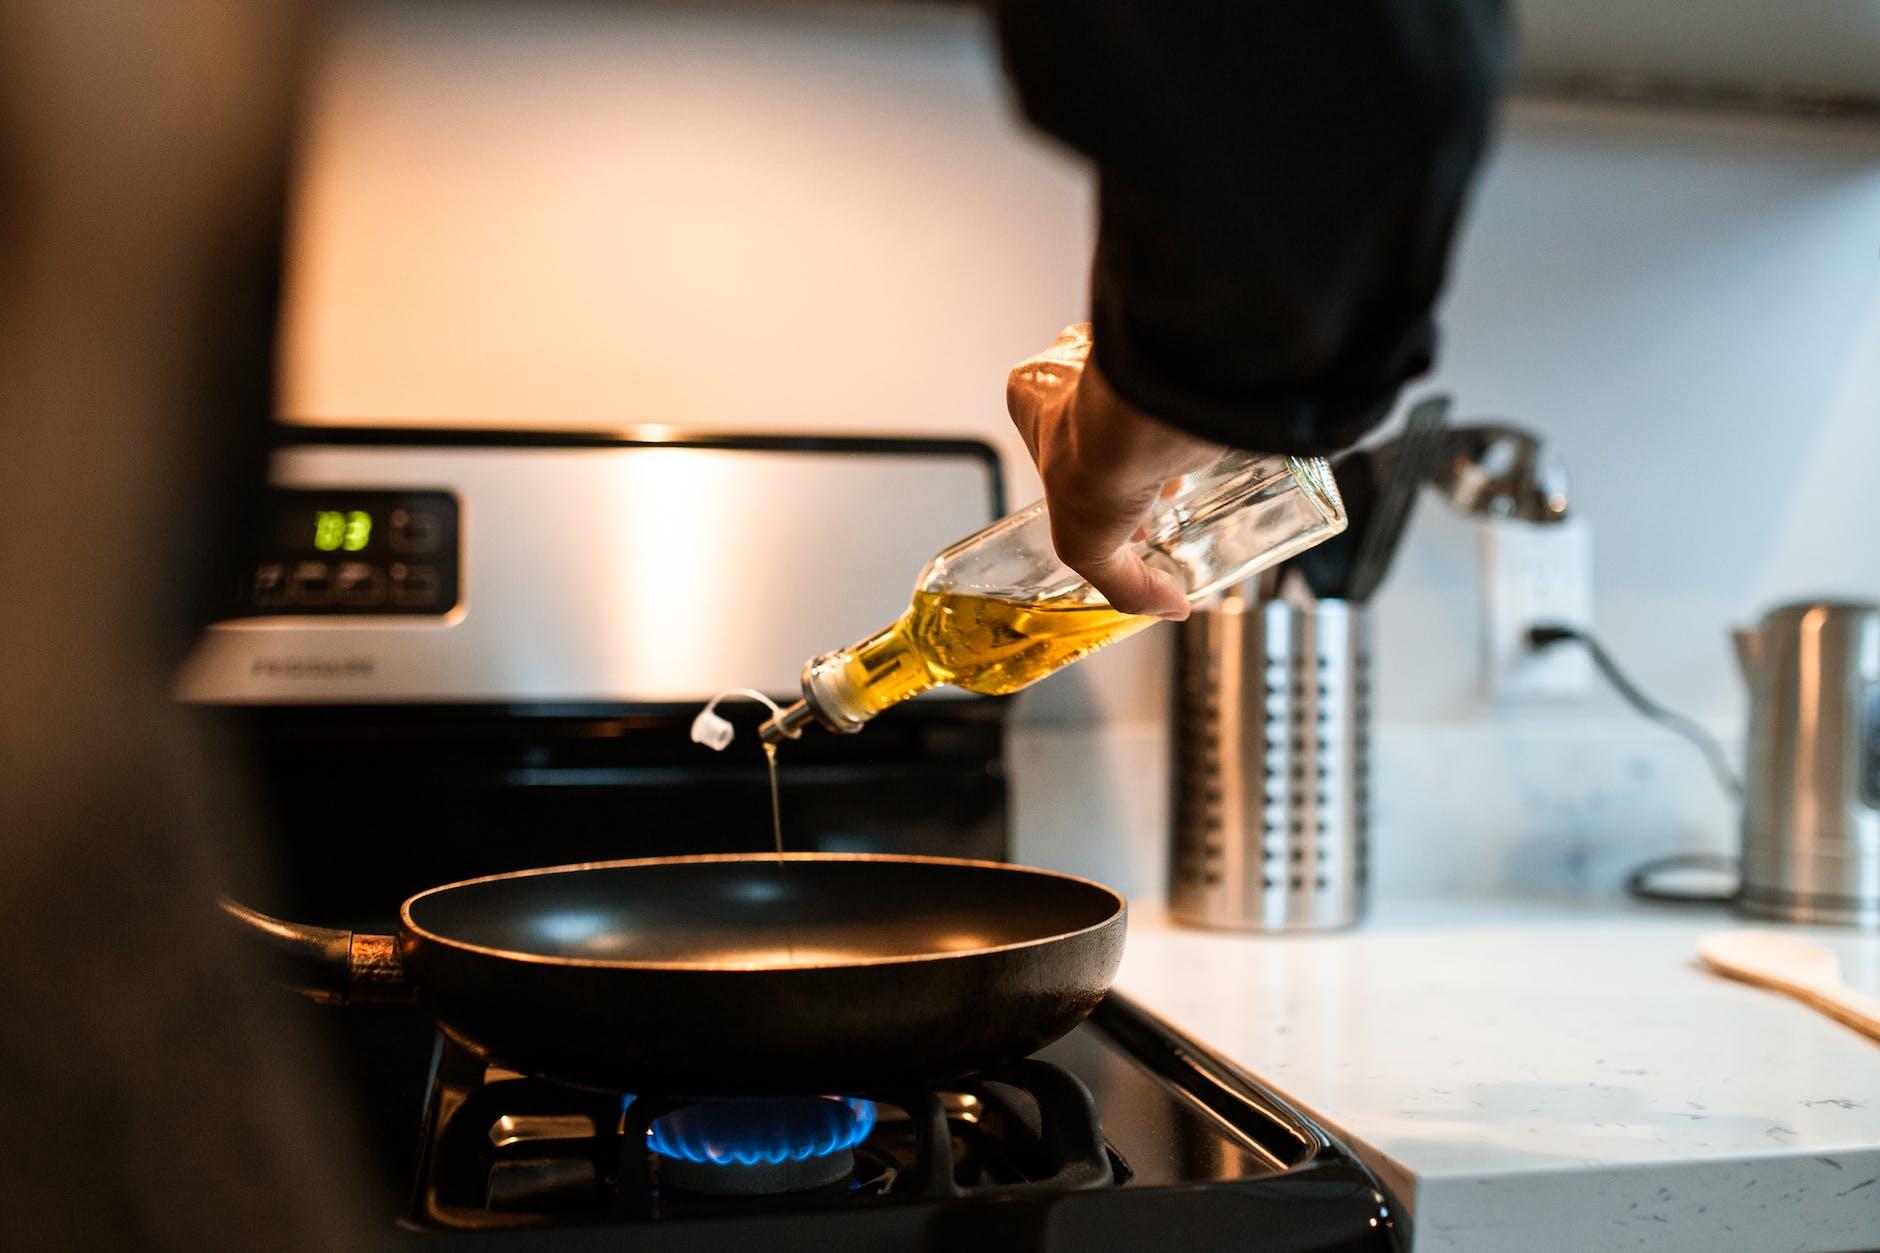 pilih minyak goreng yang tepat